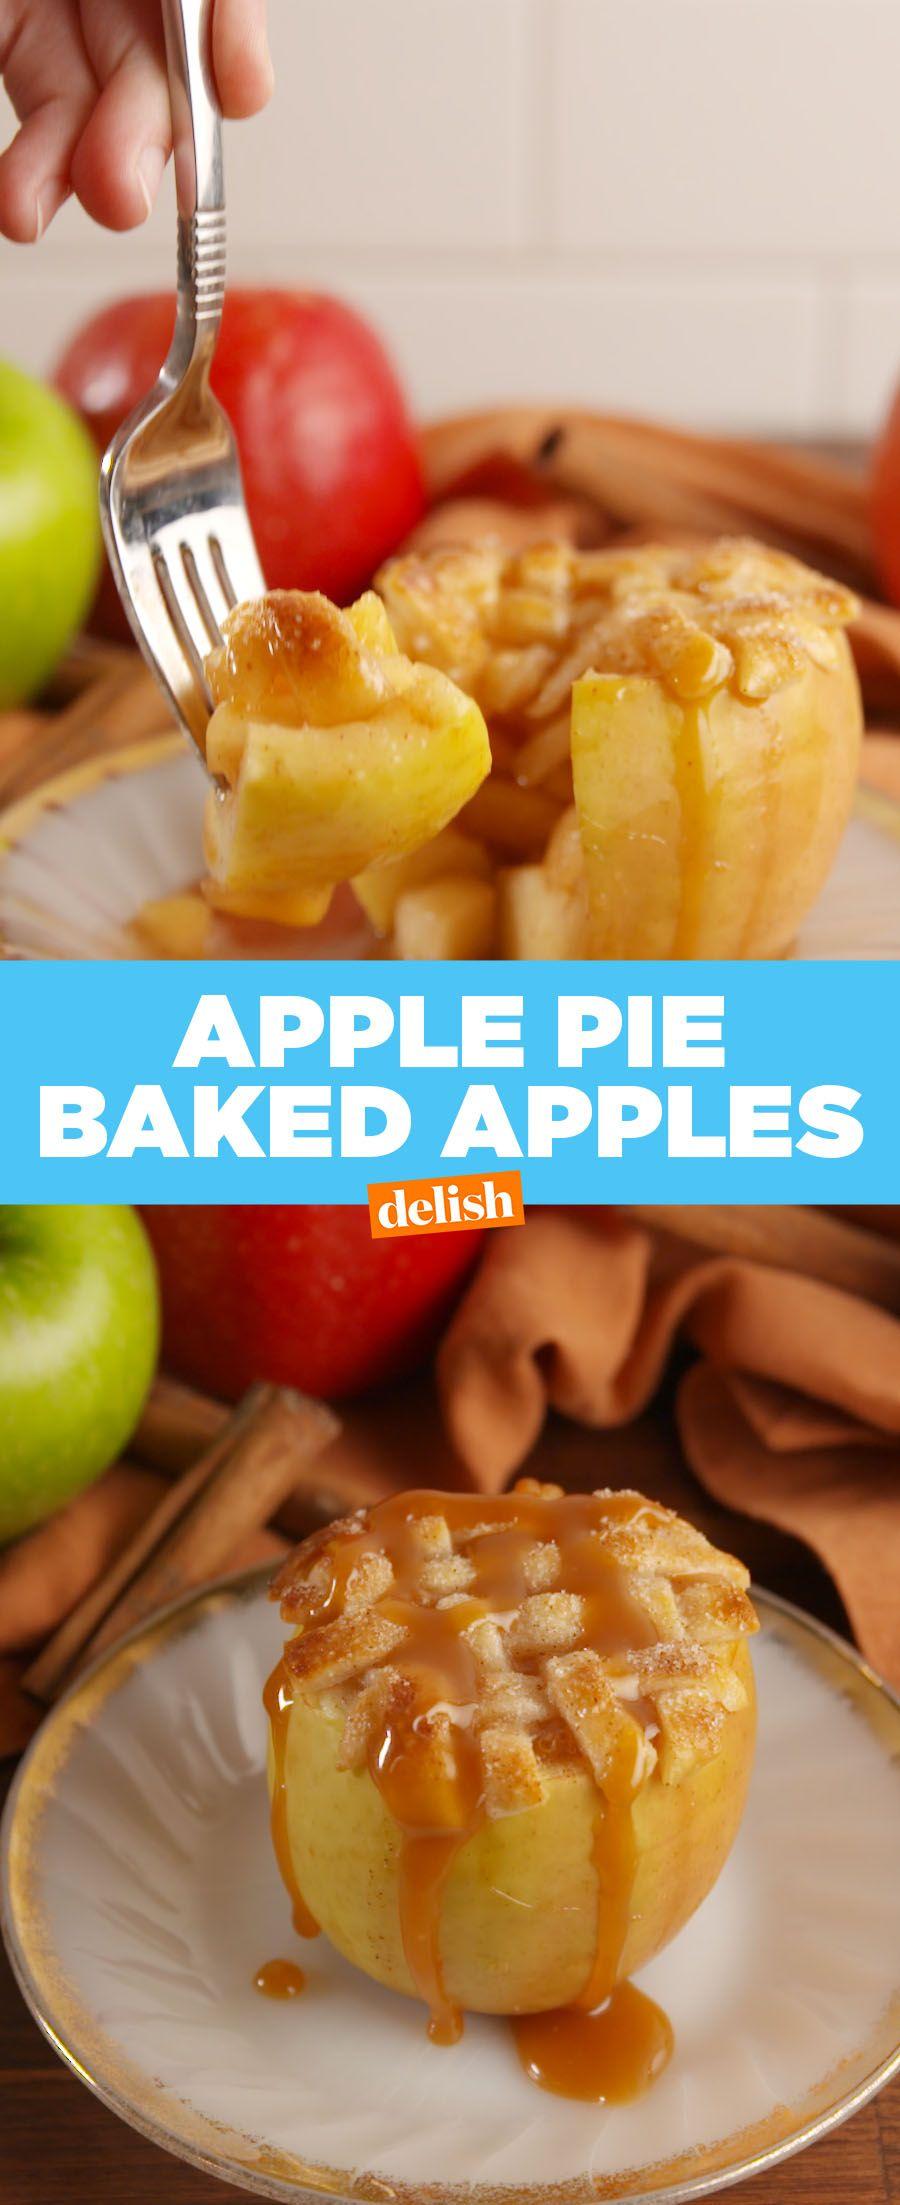 Apple Pie Baked Apples Recipe Baked apples, Apple